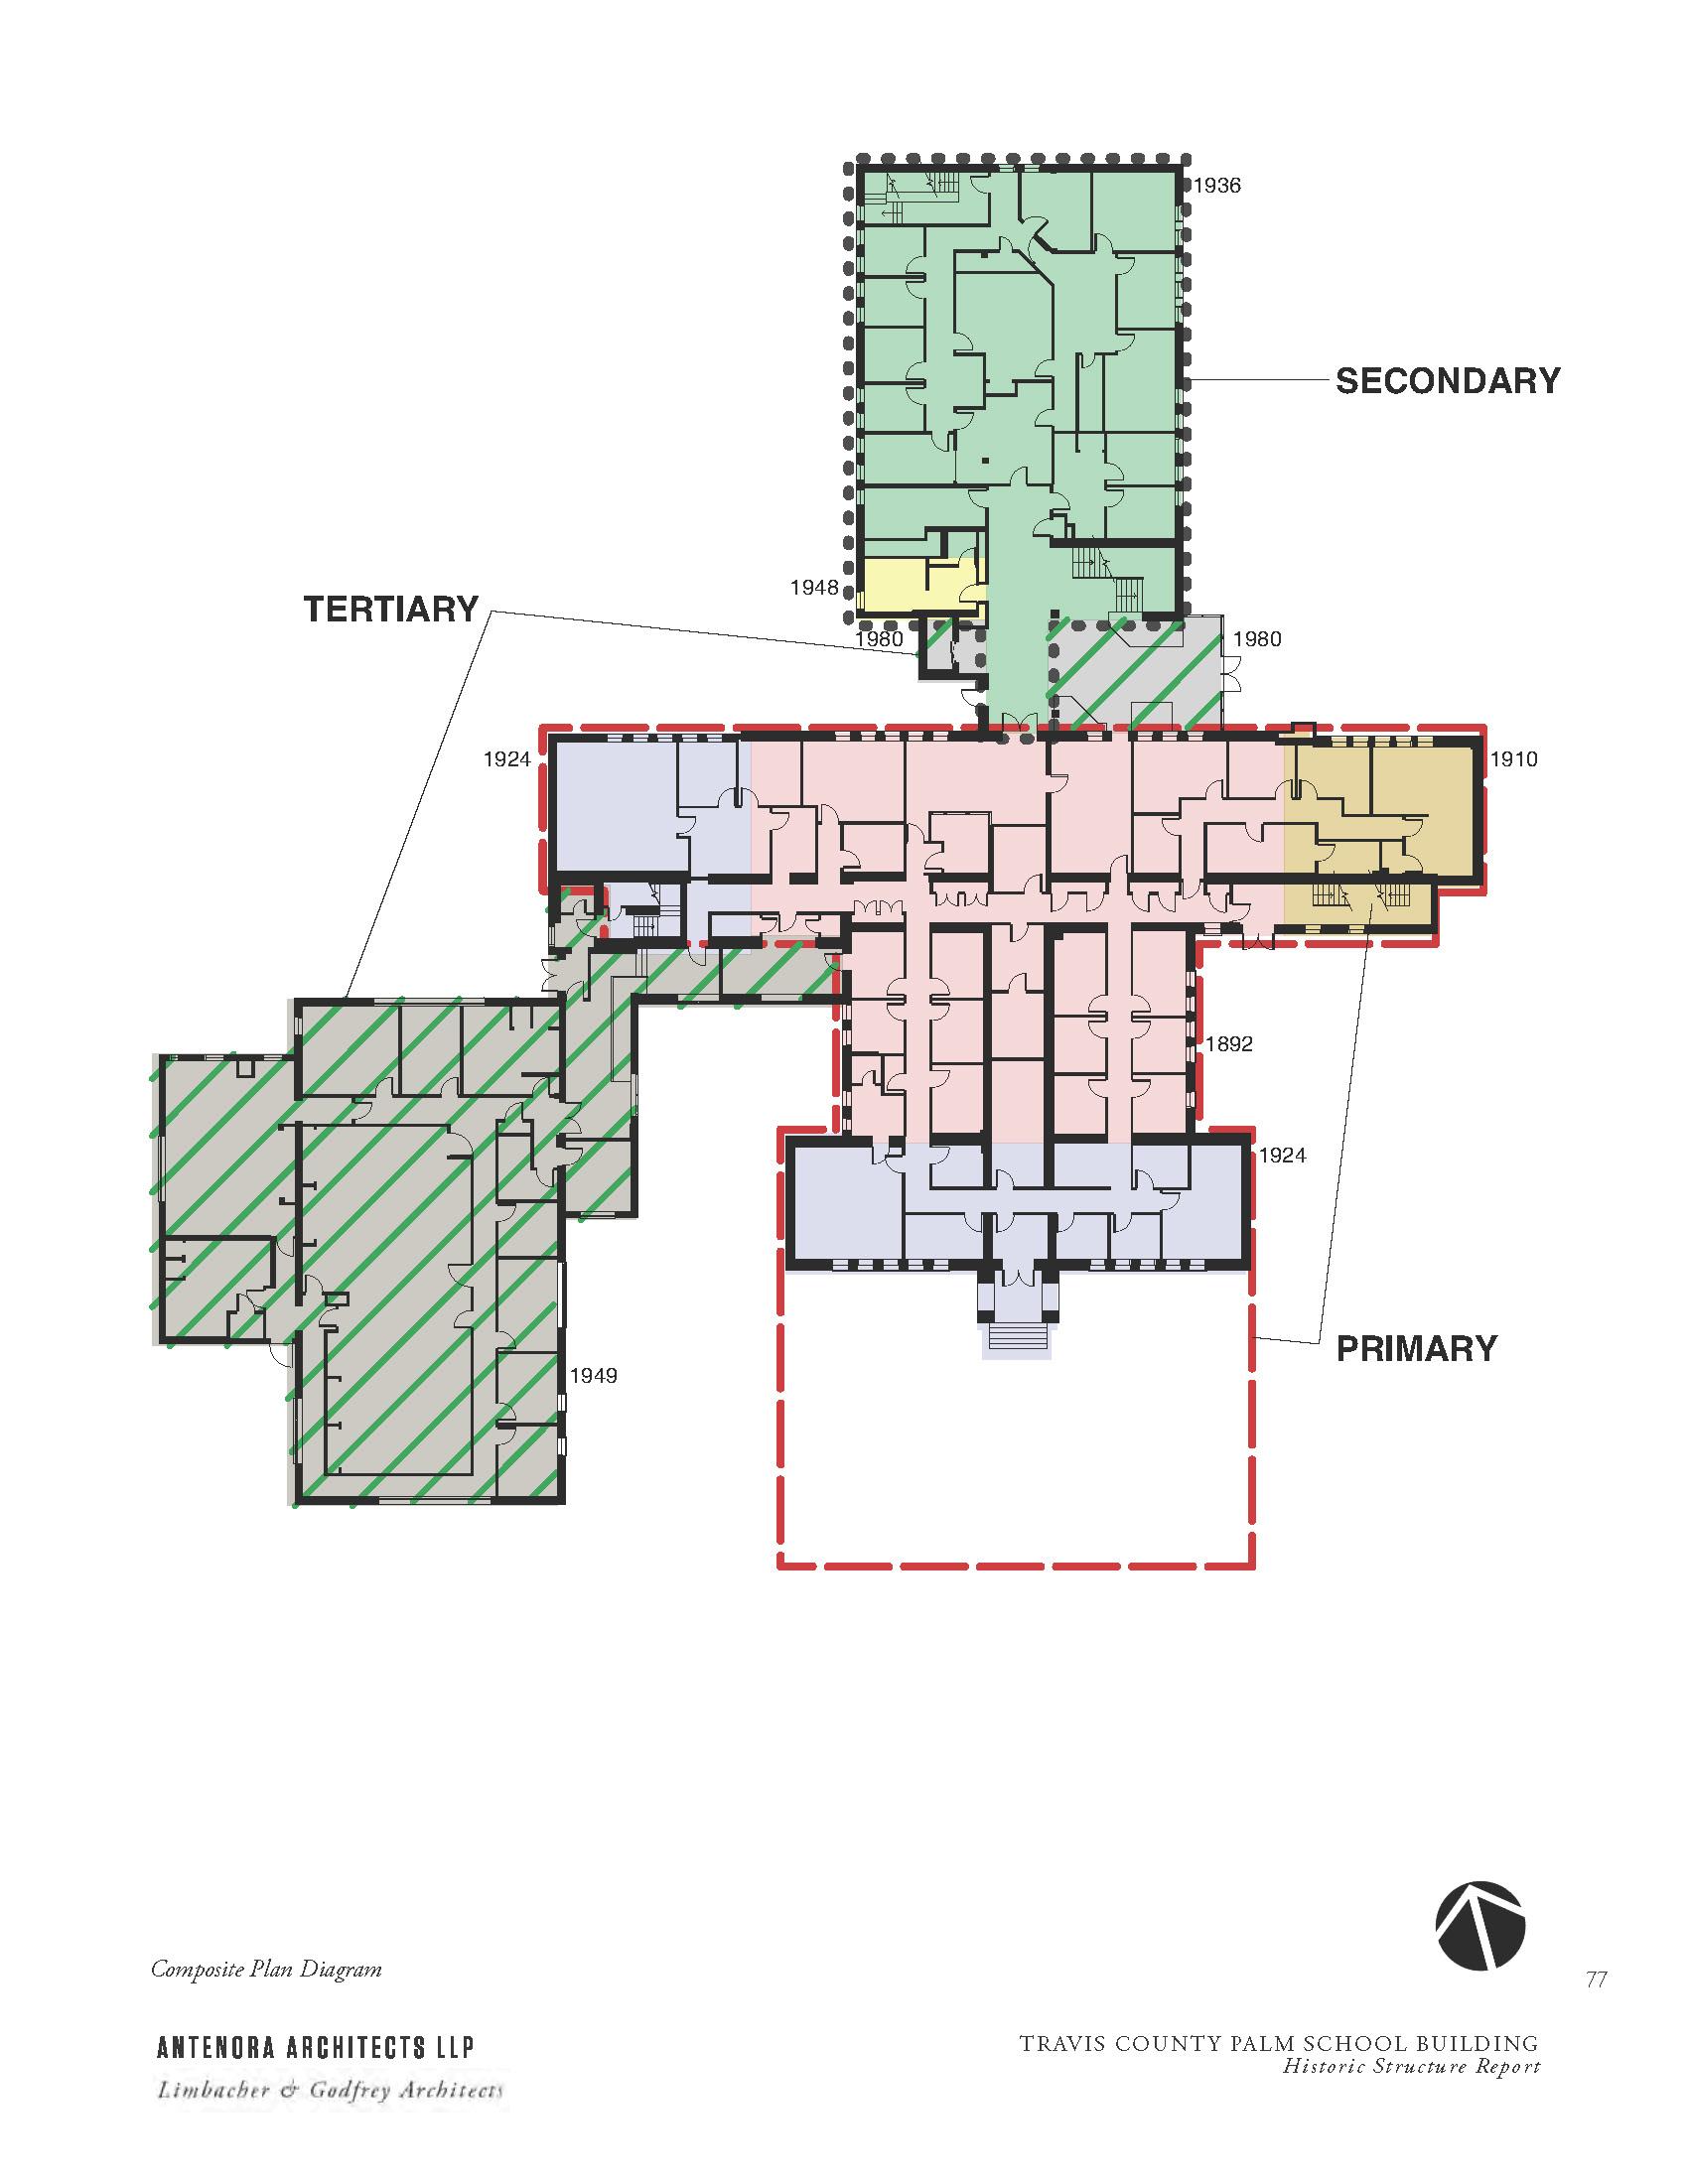 Palm School HSR Priority Zones